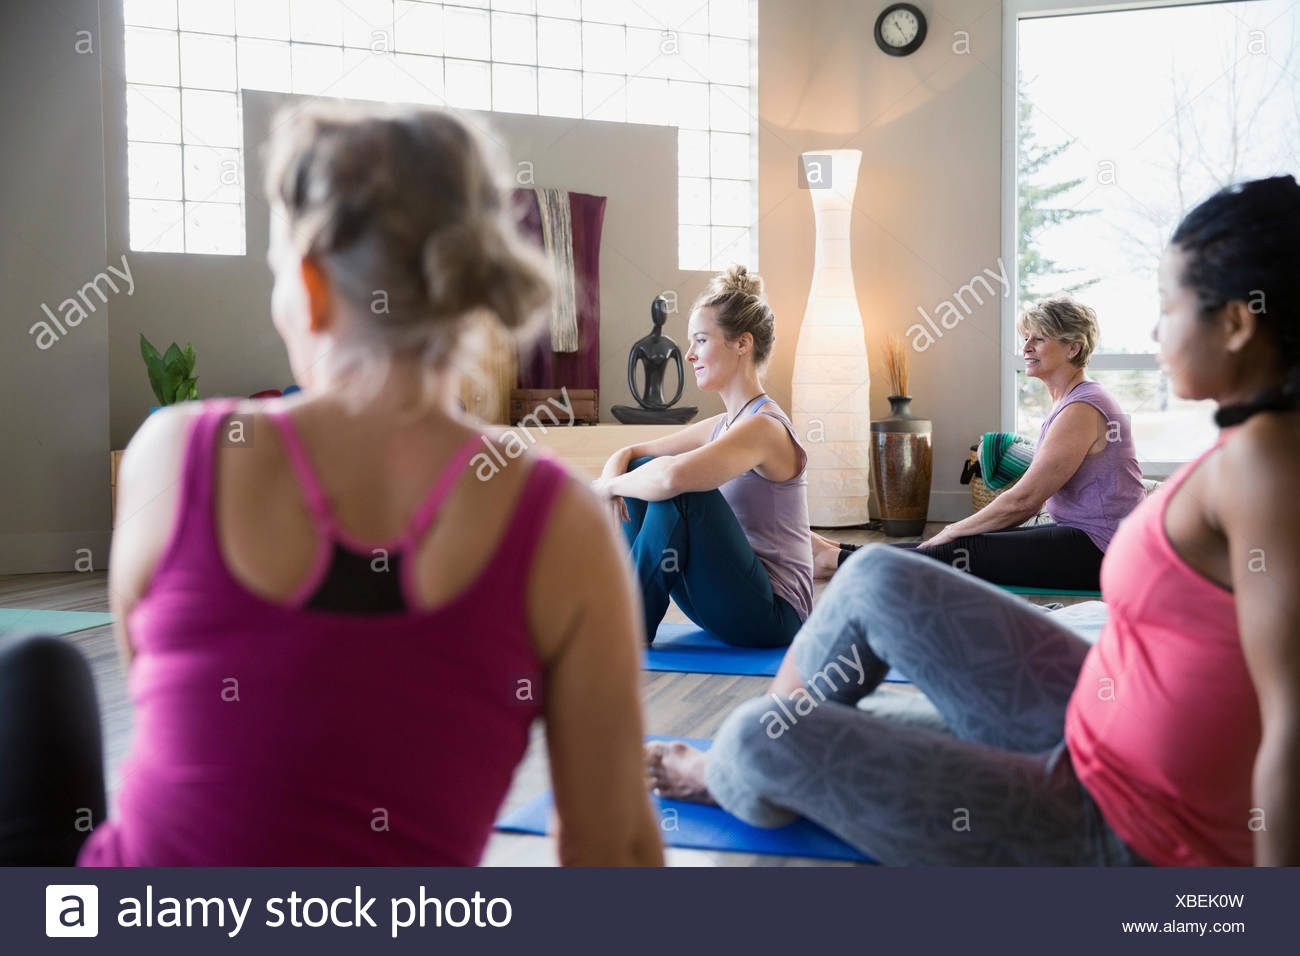 Women sitting on mats in yoga class - Stock Image